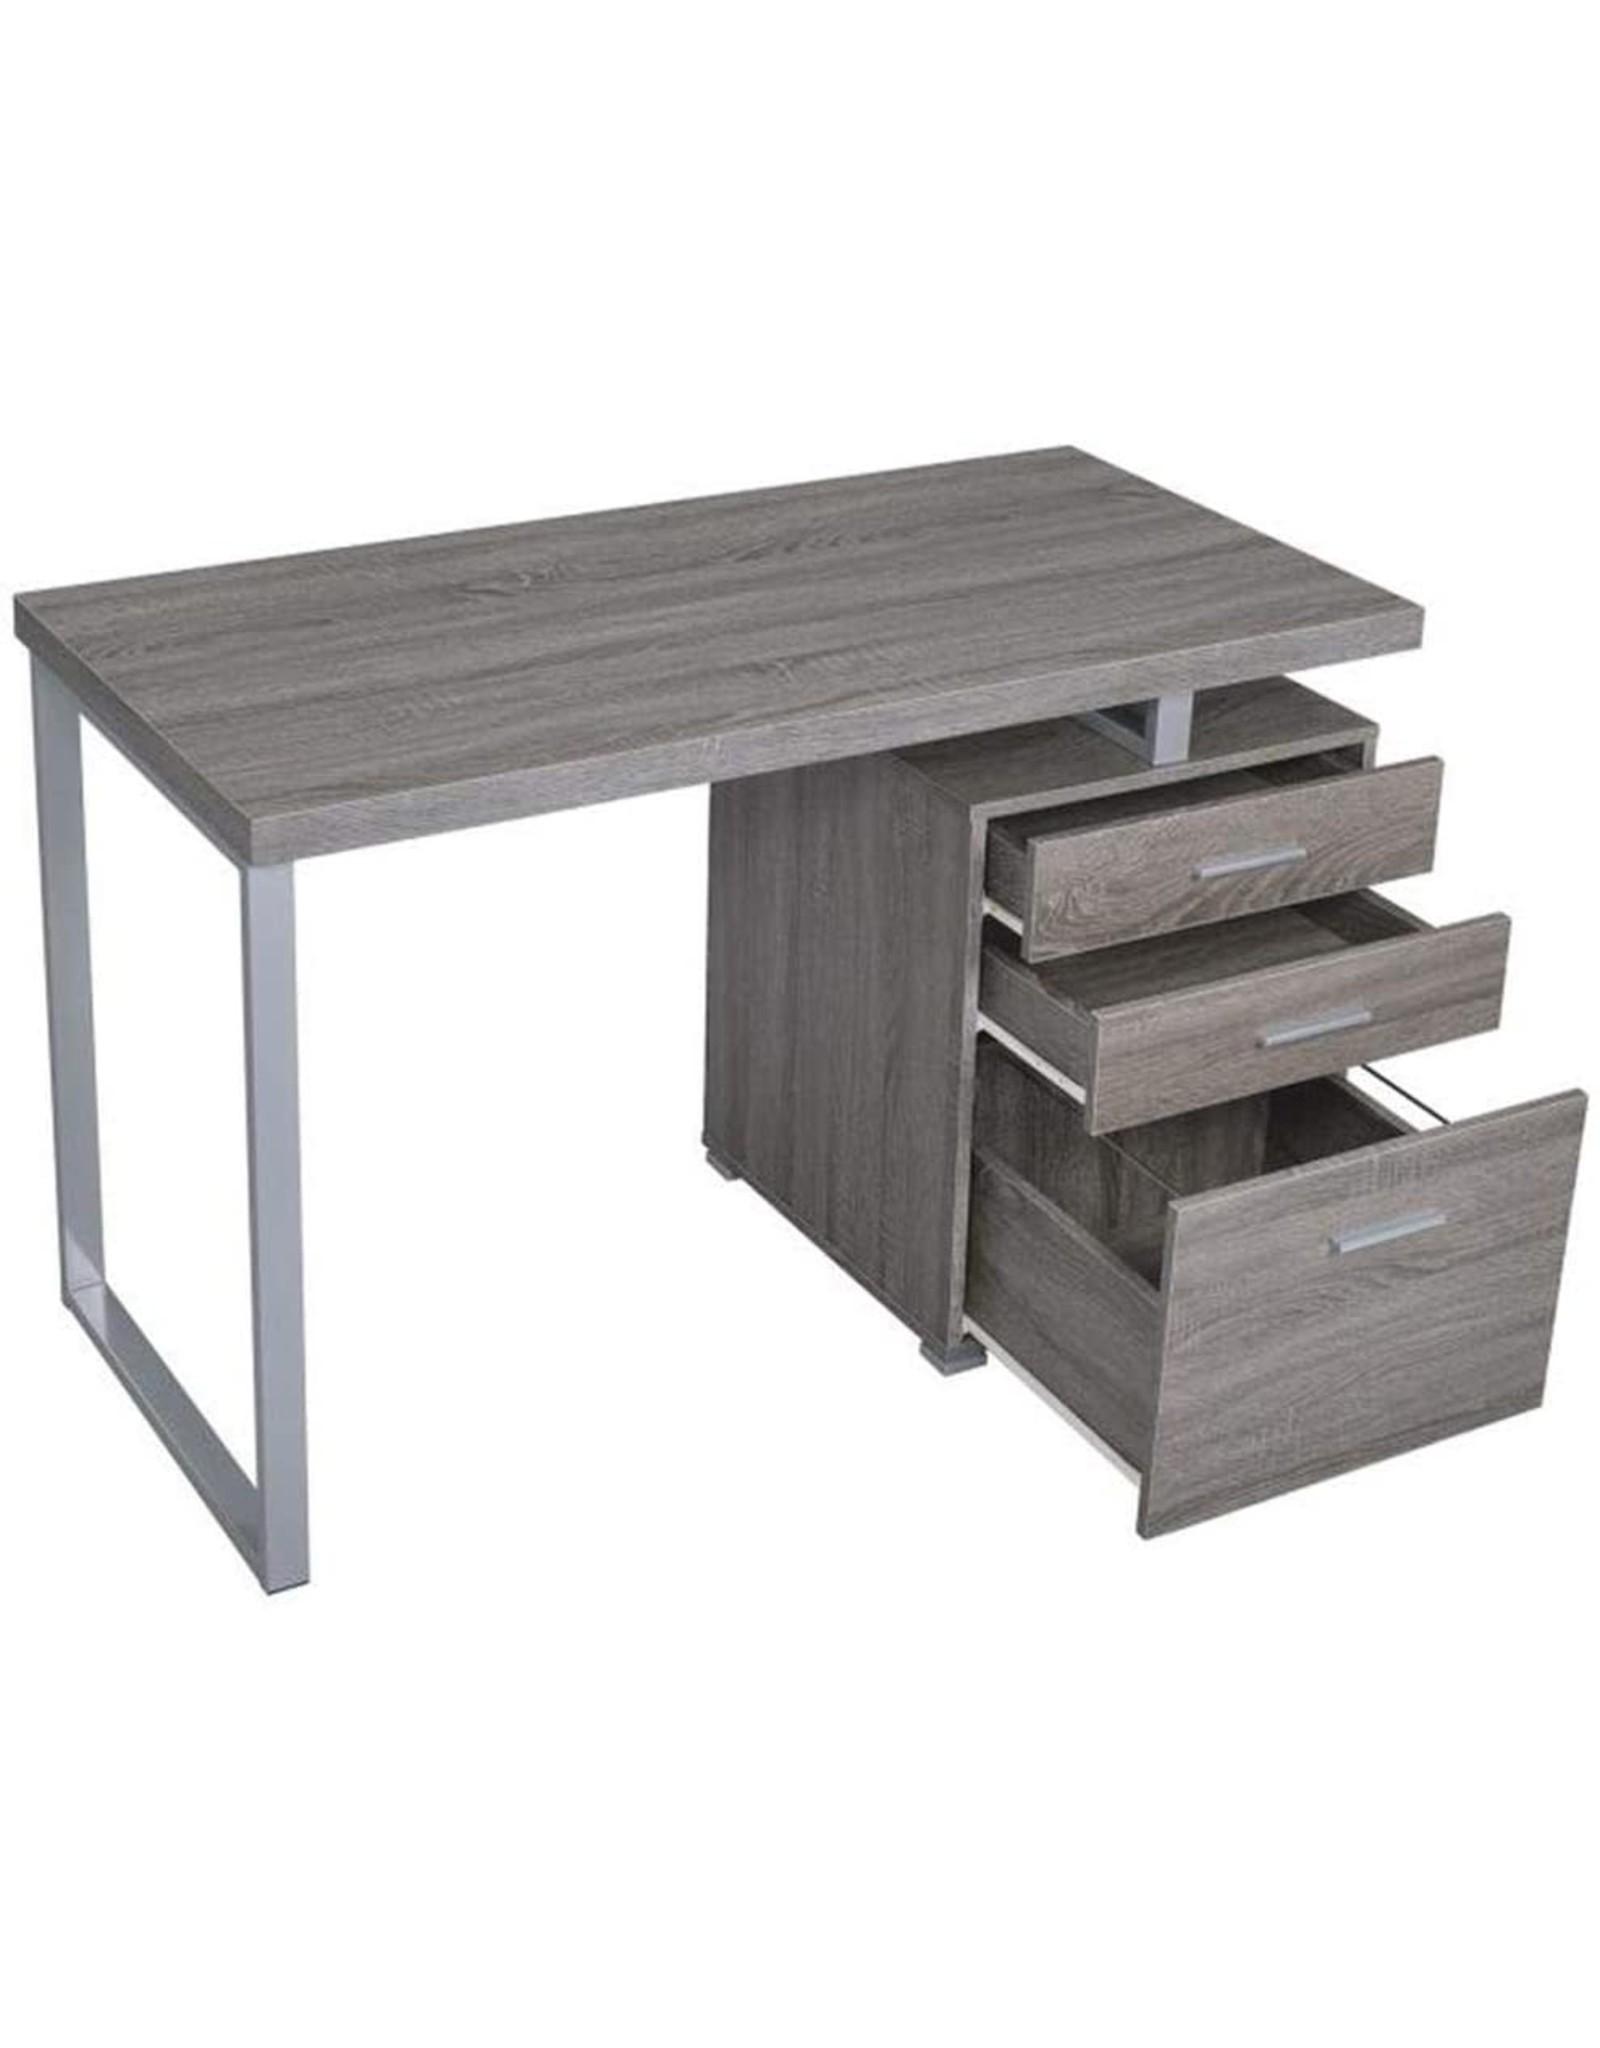 Coaster Home Furnishings Coaster Home Furniture Brennan 3-Drawer Reversible set up Office Desk  Weathered Grey